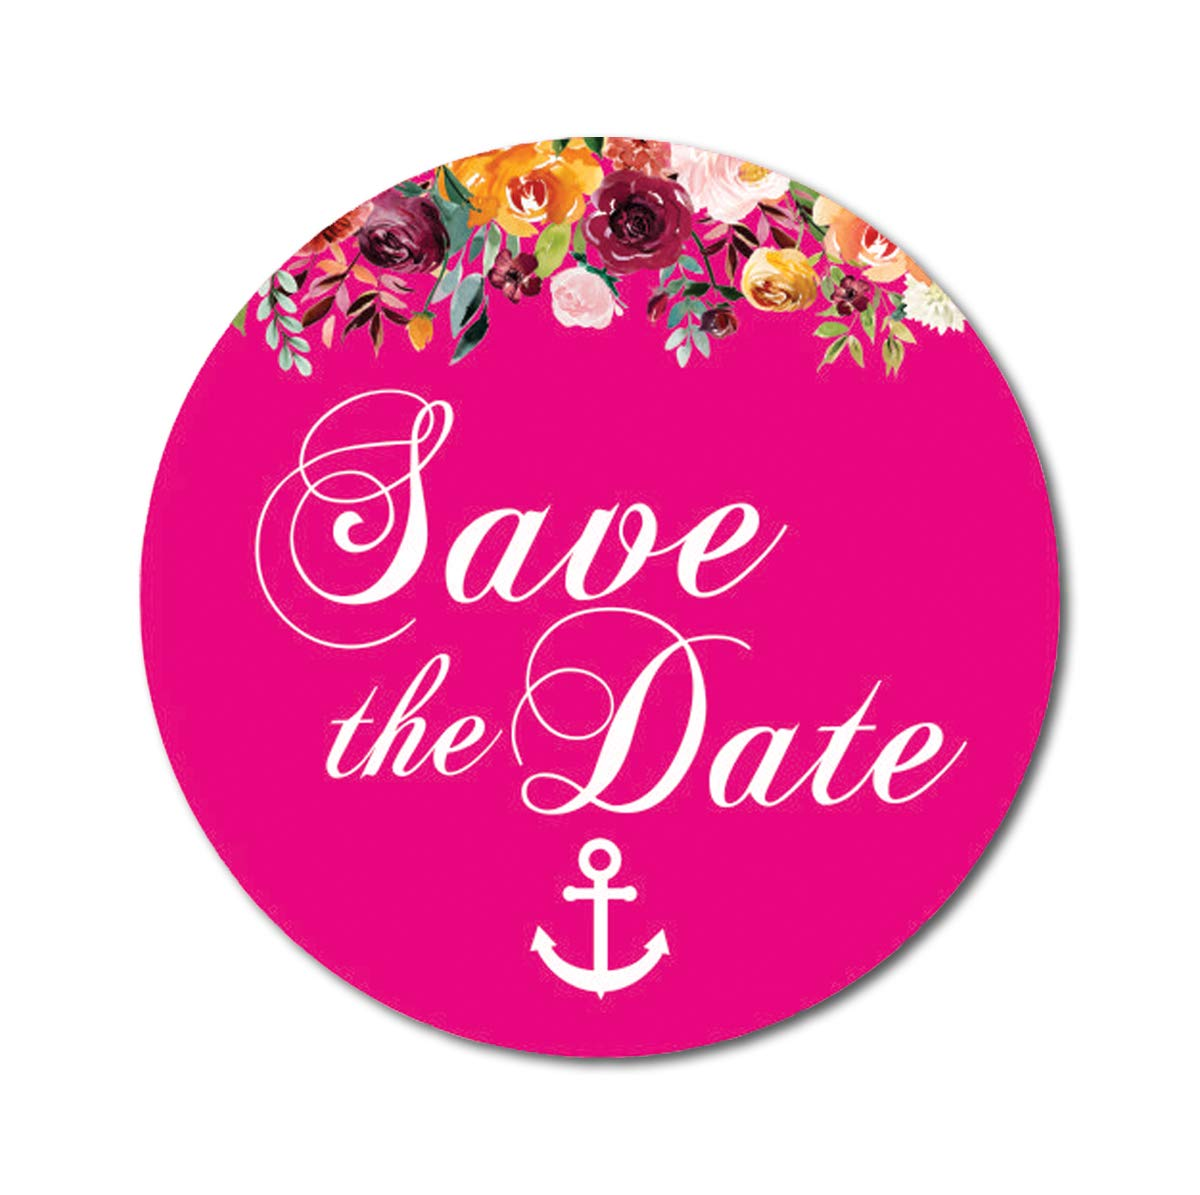 Darling Souvenir 45 Pz Avorio floreale rotondo /& Anchor Save the date autoadesivi DIY Envelope Seals-1,6 pollici